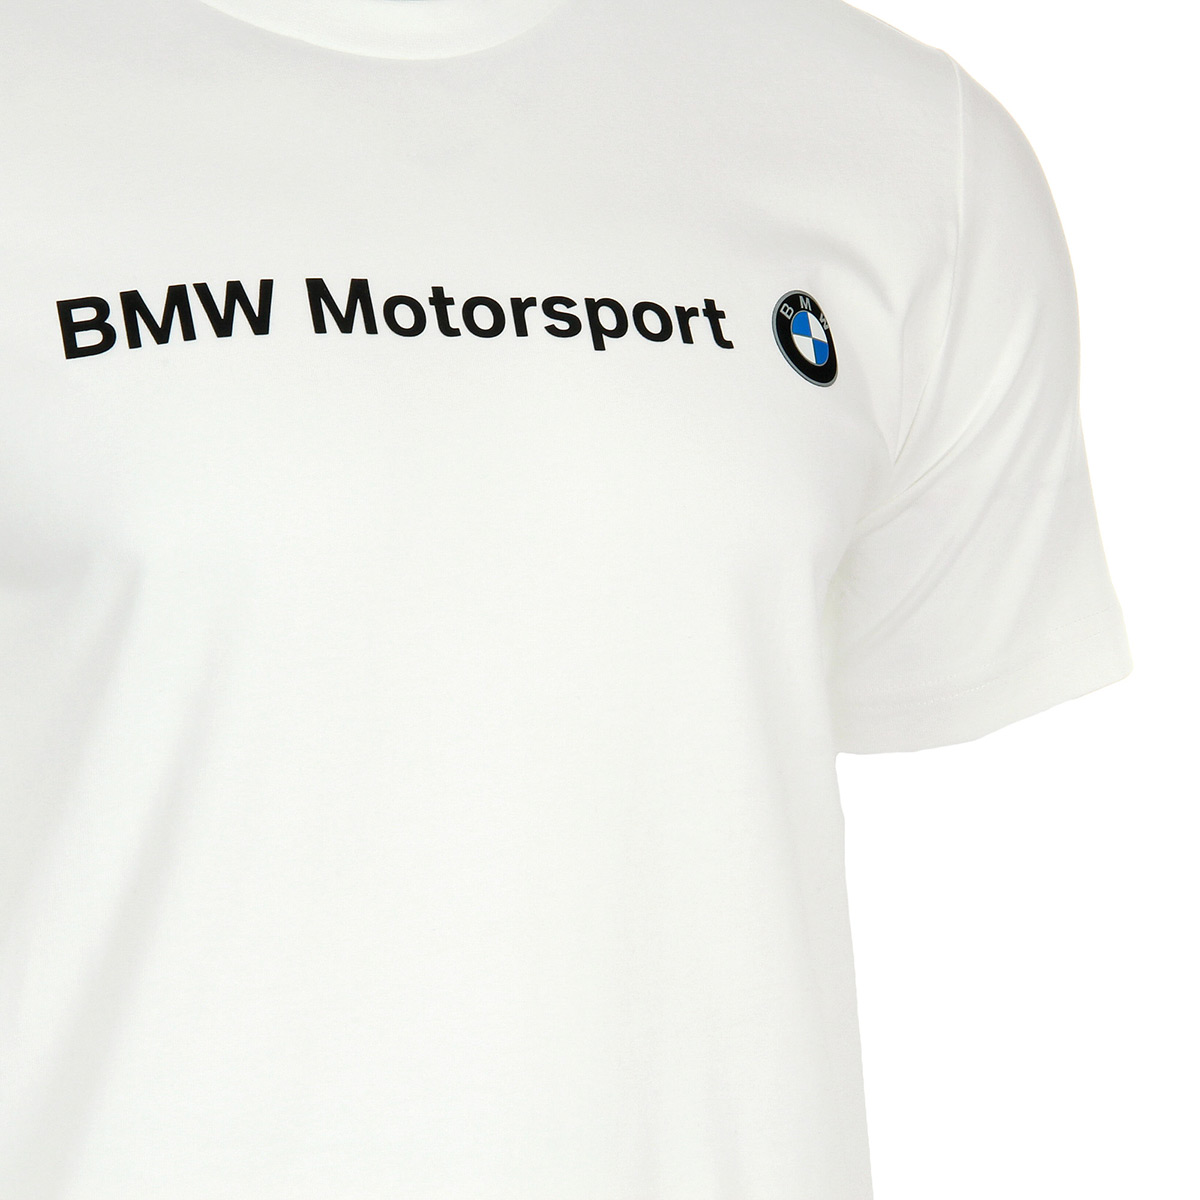 Puma BMW MSP Logo Tee White 57277202, T-Shirts homme